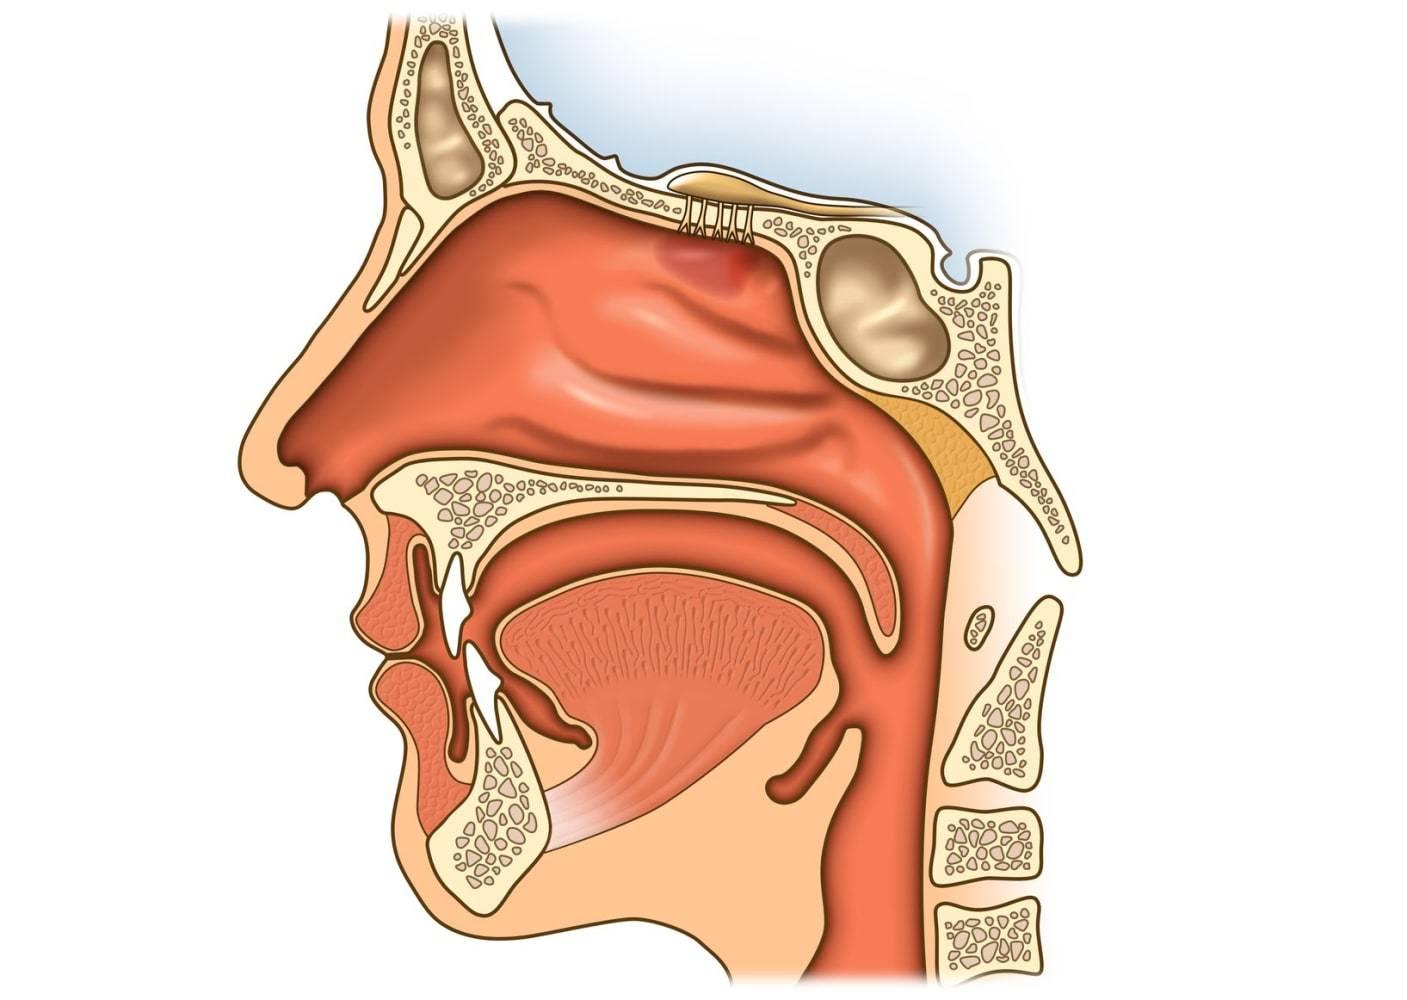 Анемизация слизистой носа при кровотечениях: суть, техника проведения | food and health